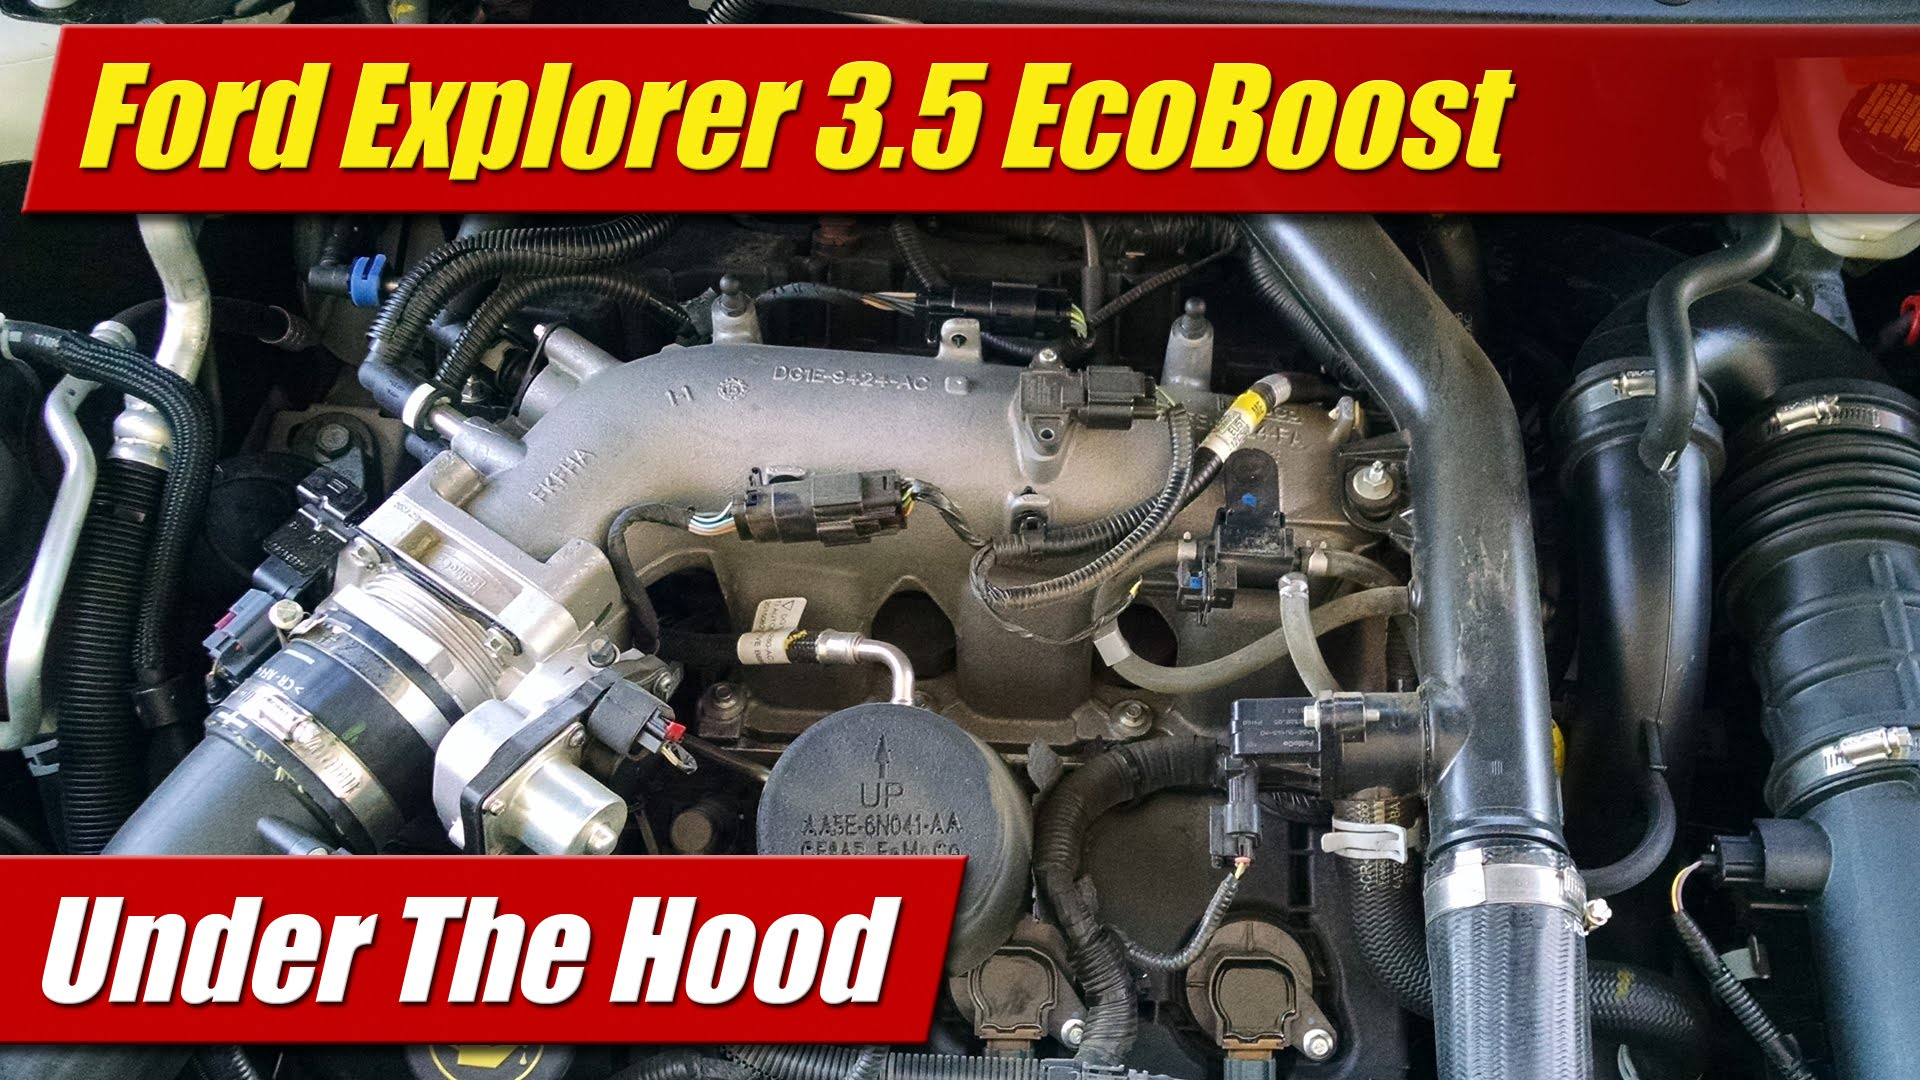 f150 engine diagram trailer wiring 5 pin plug under the hood: ford explorer 3.5 ecoboost - testdriven.tv